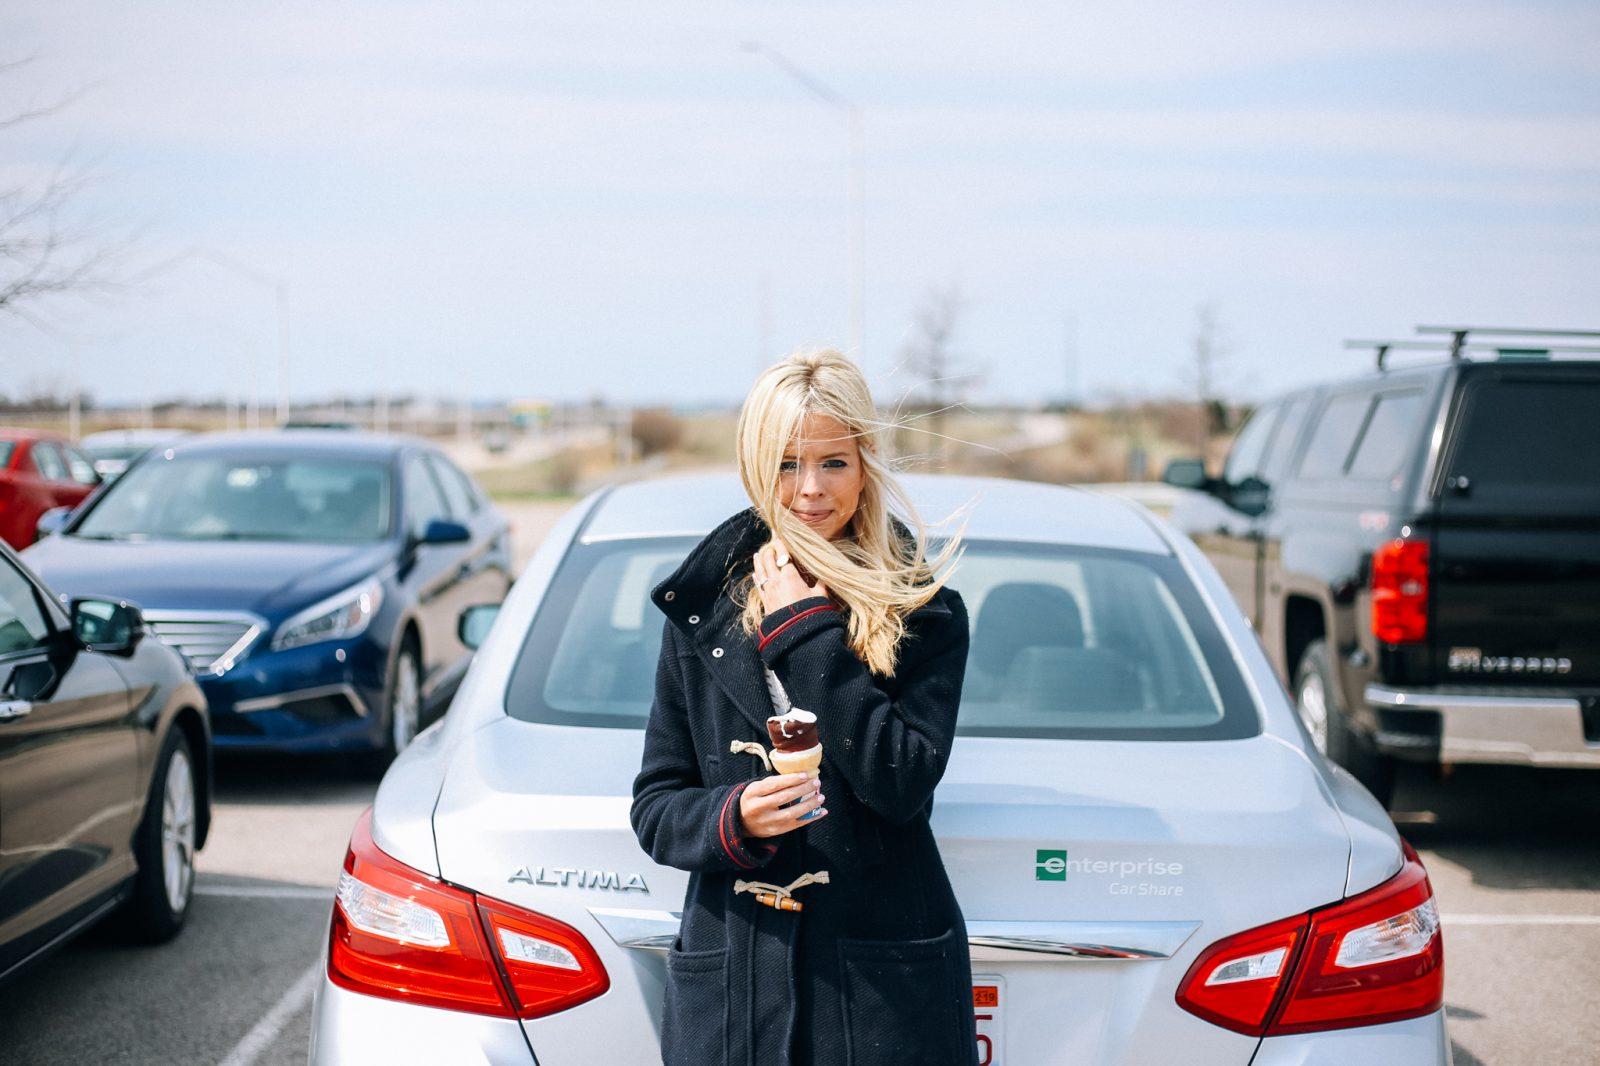 Cancel Enterprise Car Share Membership